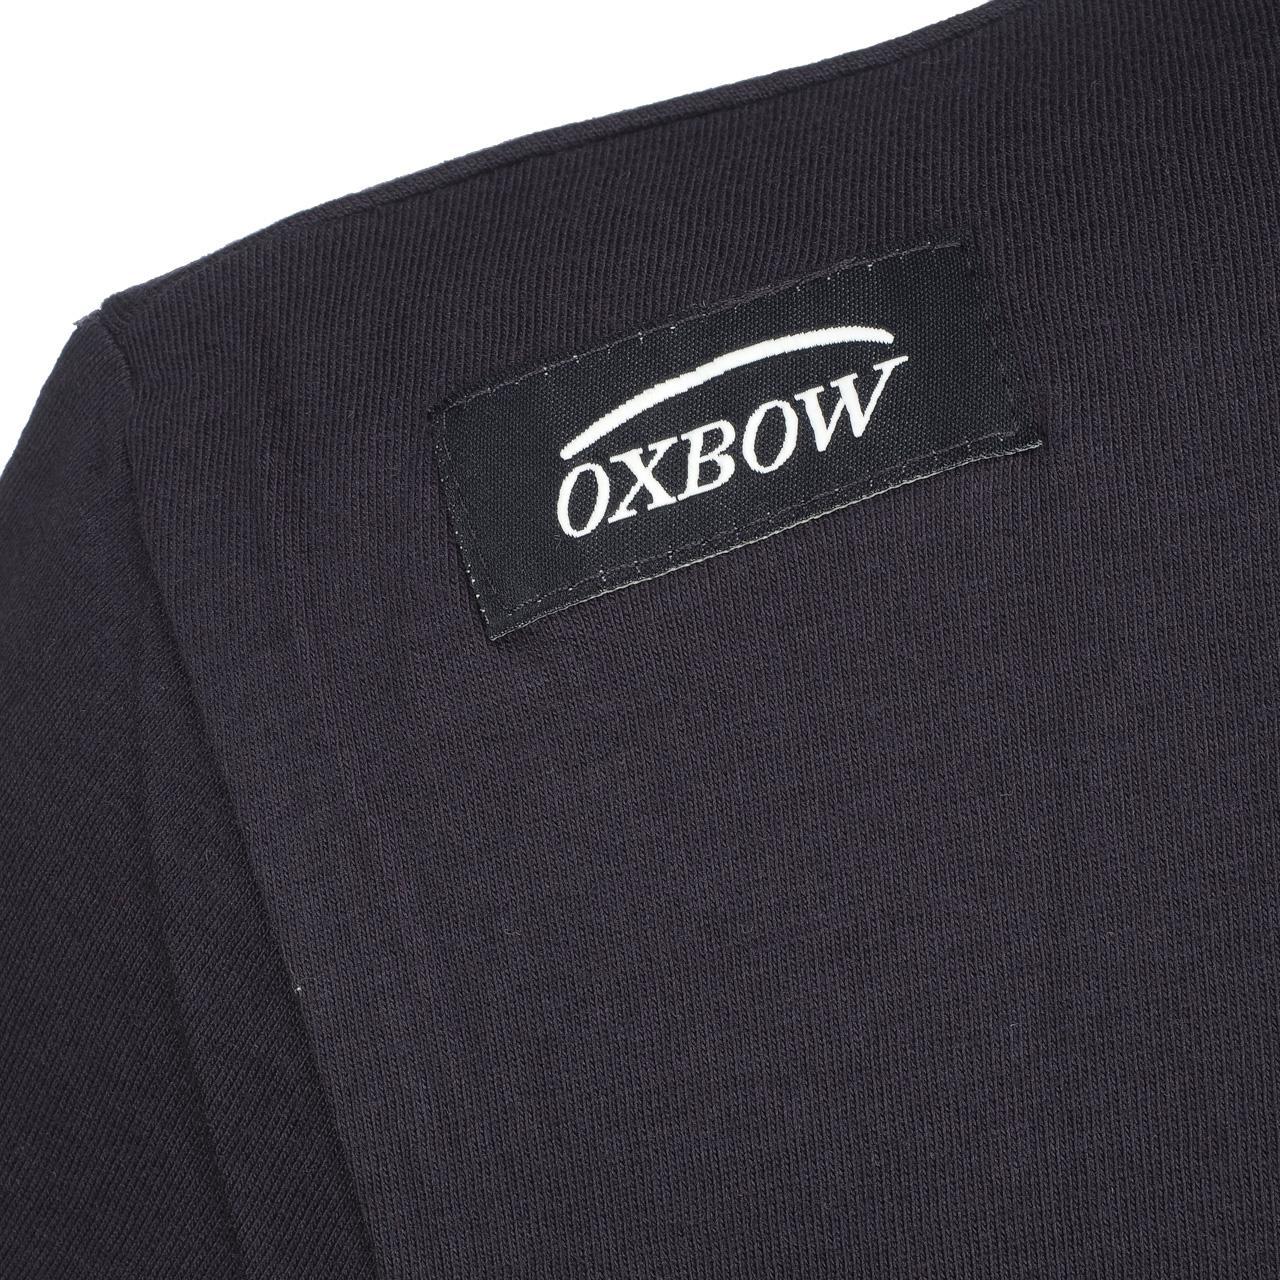 Short-Oxbow-Sanfre-Navy-Mc-Oxbow-Blue-47169-New thumbnail 4